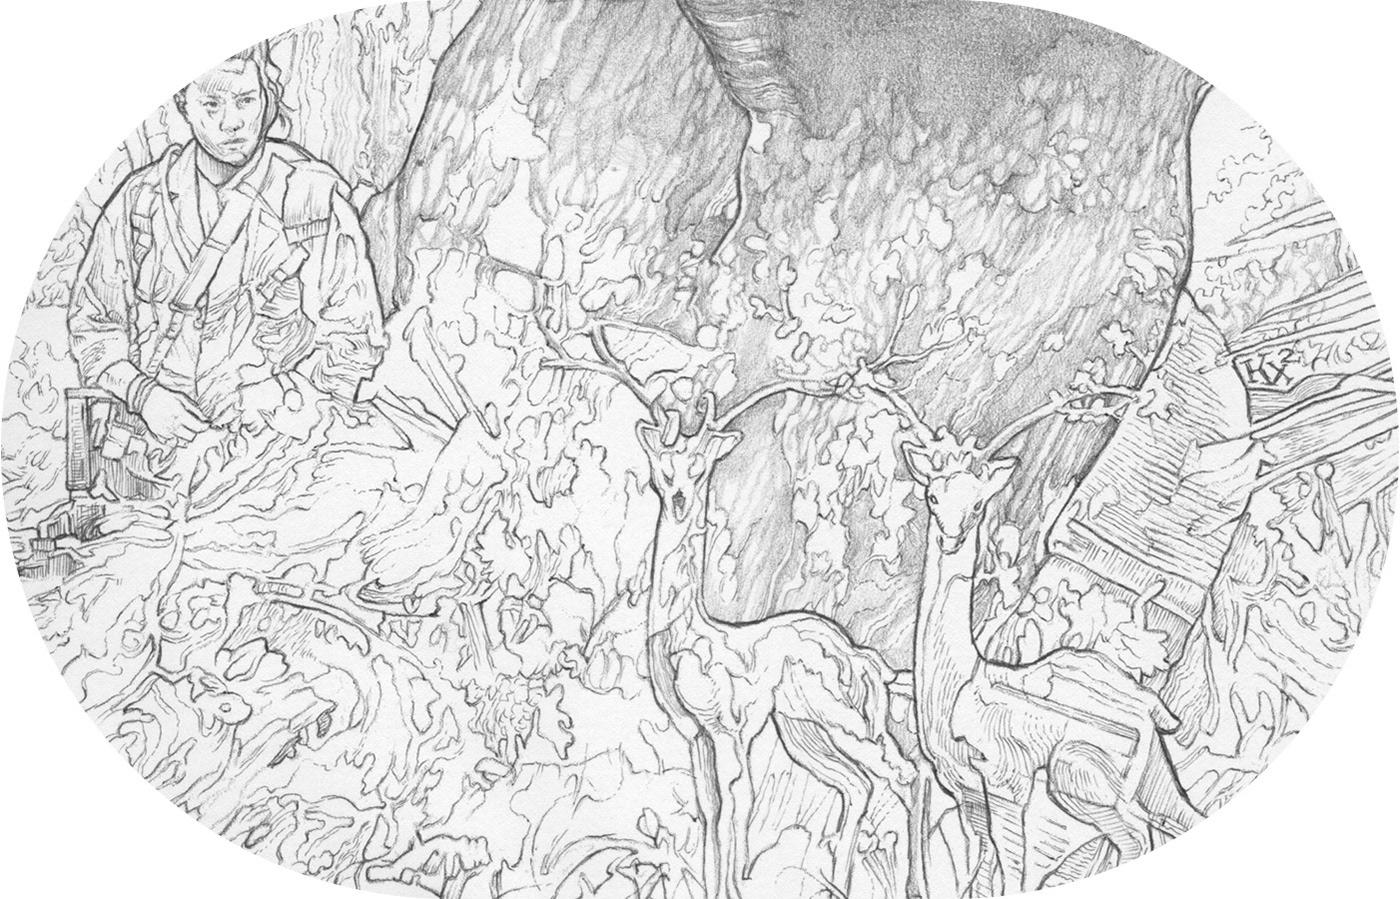 artwork Domaradzki Drawing  ILLUSTRATION  nine poster steelbook StudioKxx Various clients